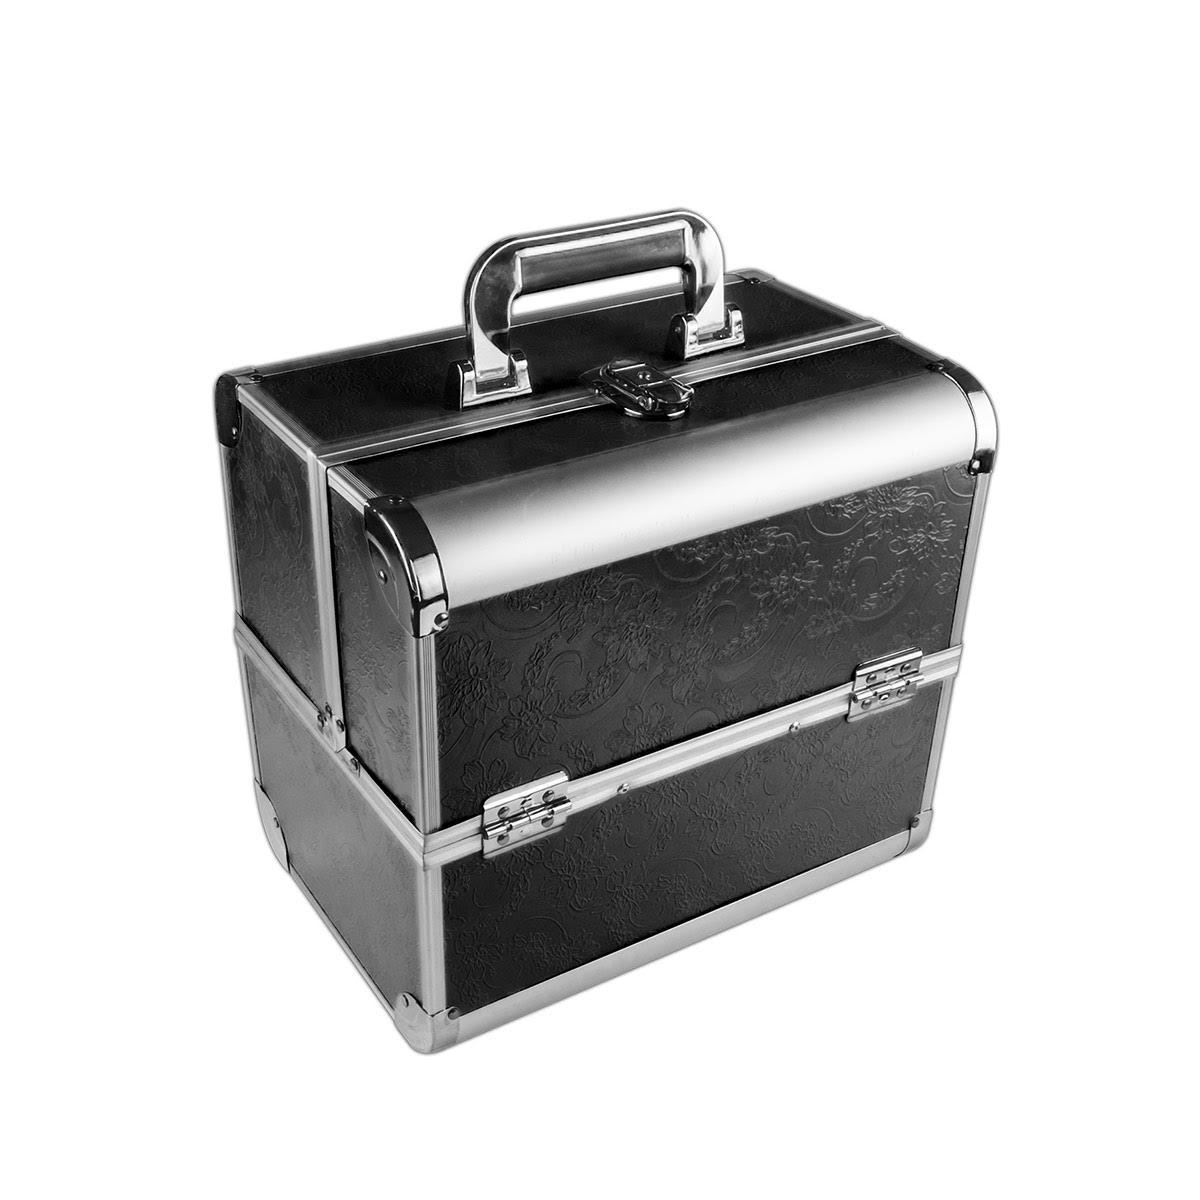 Ráj nehtů Kosmetický kufřík SENSE - dekor, černý